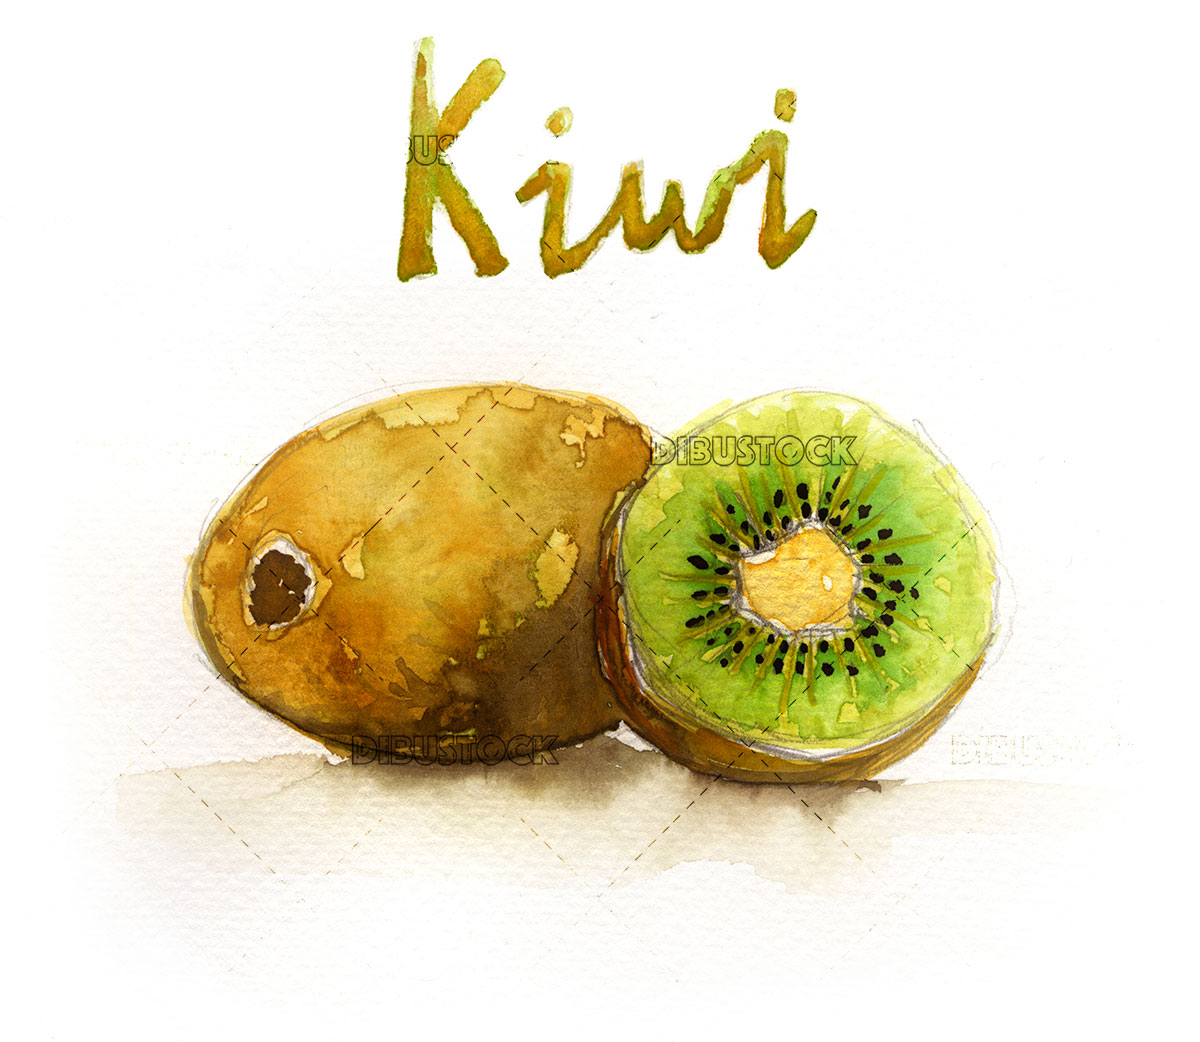 watercolor illustration of kiwi fruit